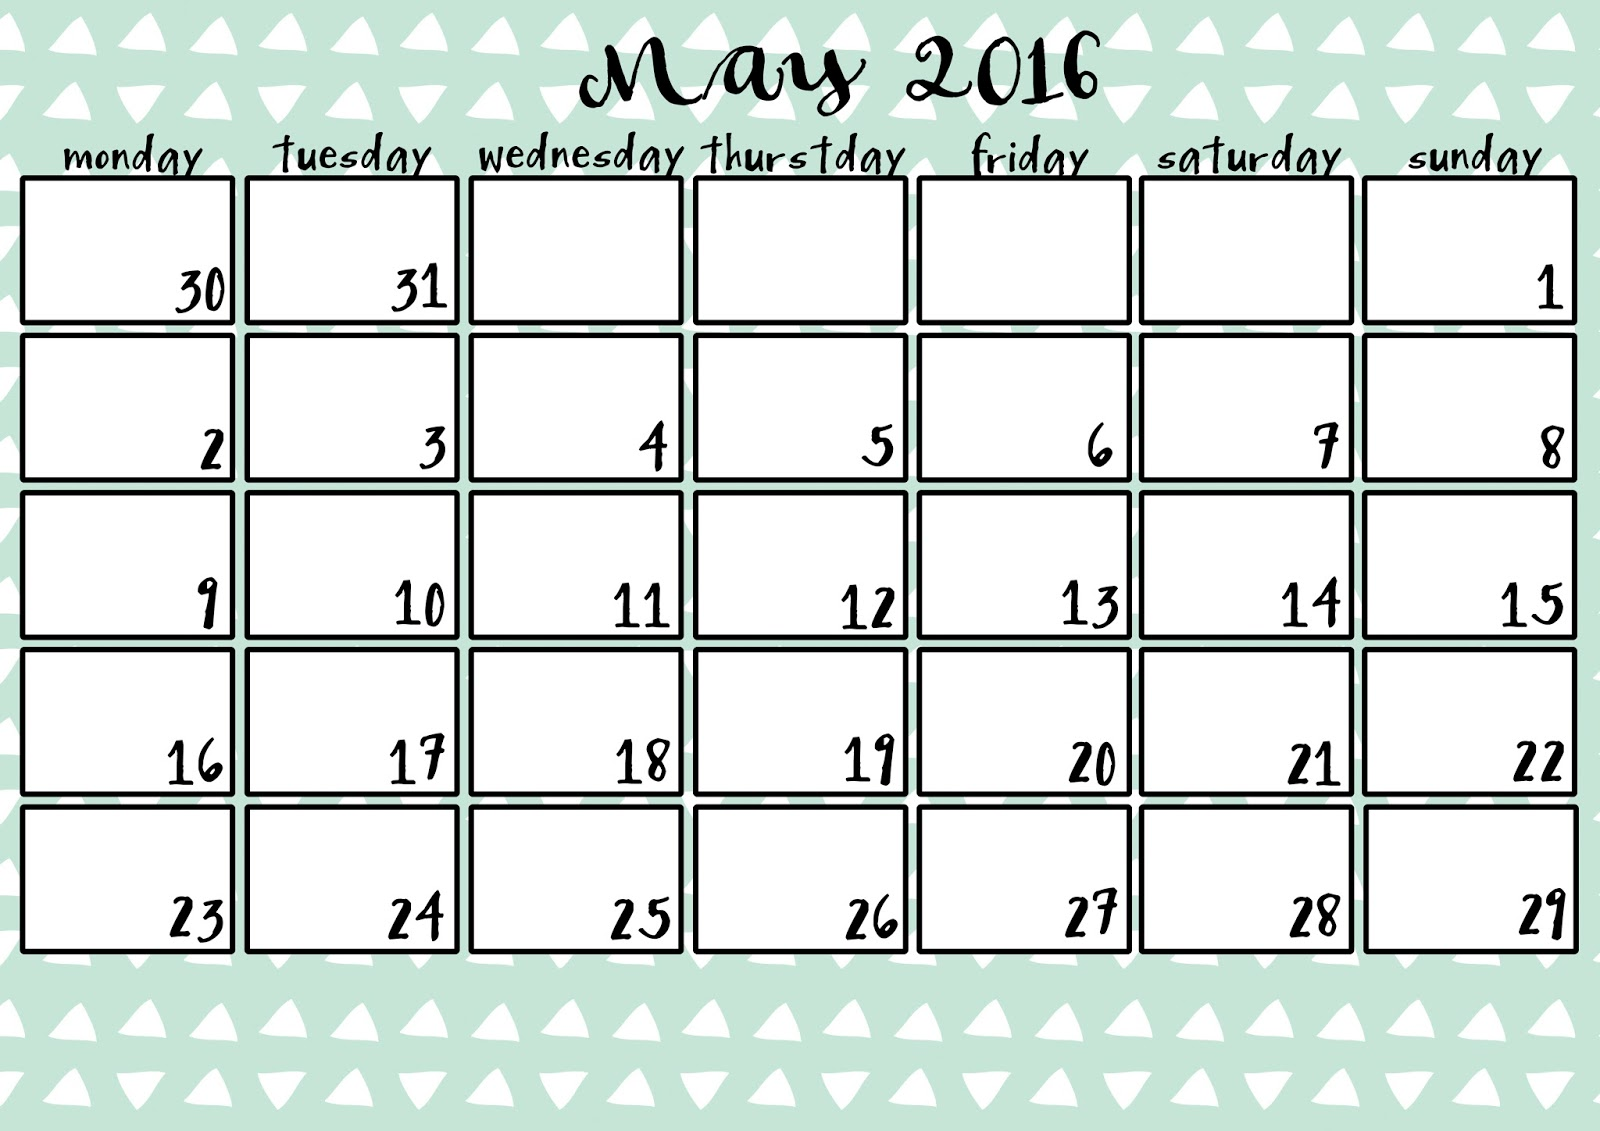 kalendar kveten 2014 Madame Coquette: kalendář na rok 2016 k vytištění kalendar kveten 2014